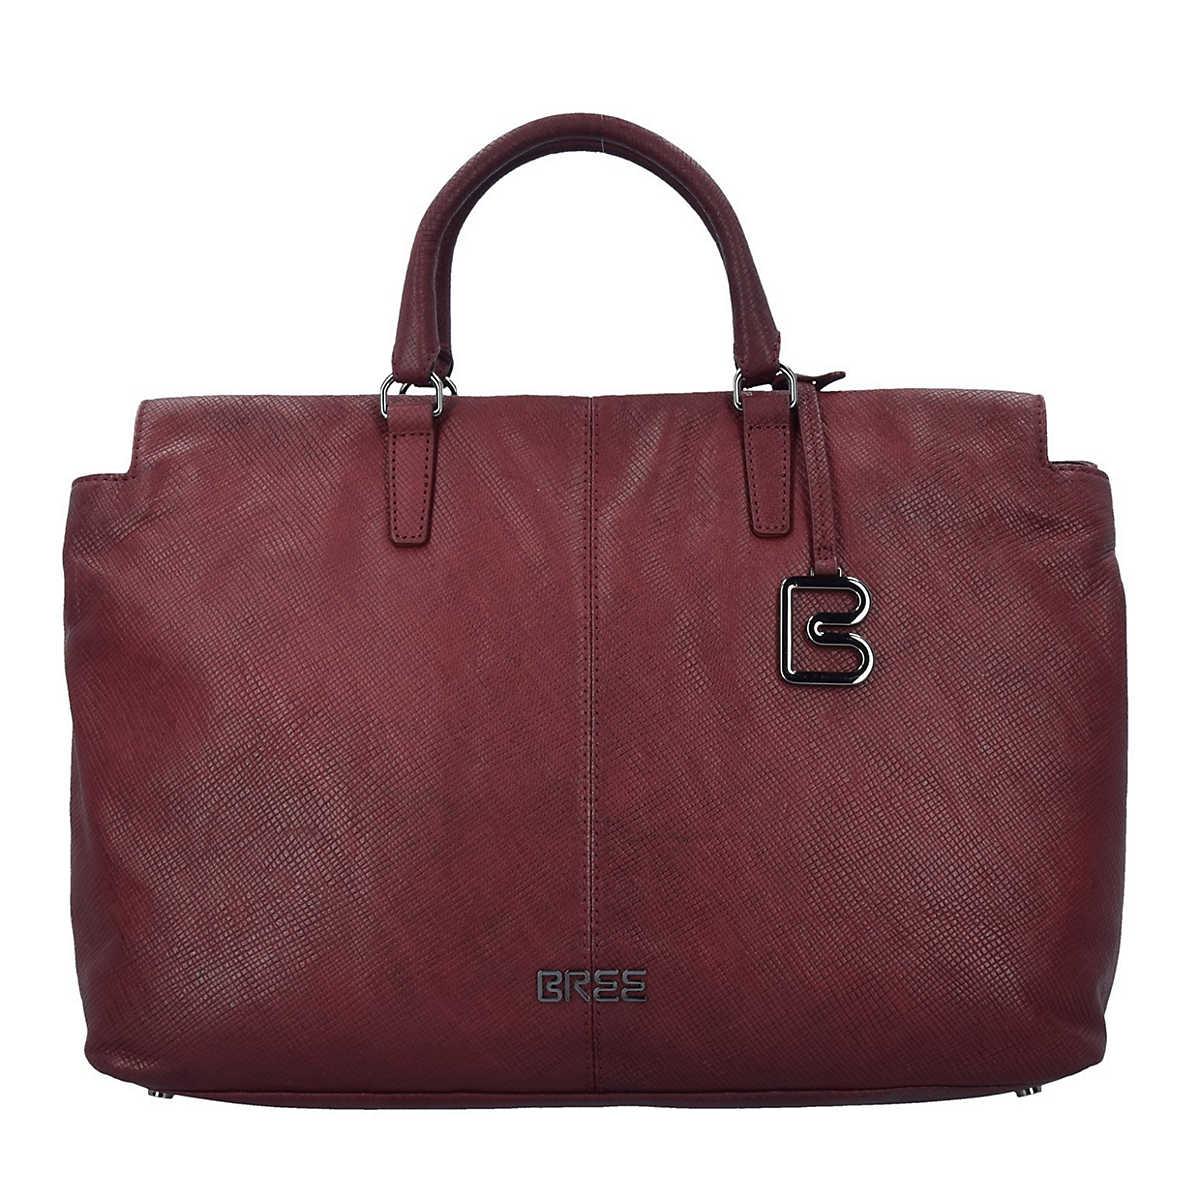 Couco 2 Shopper Tasche Leder 40 cm rot - Bree - Shopper - Taschen - mirapodo.de